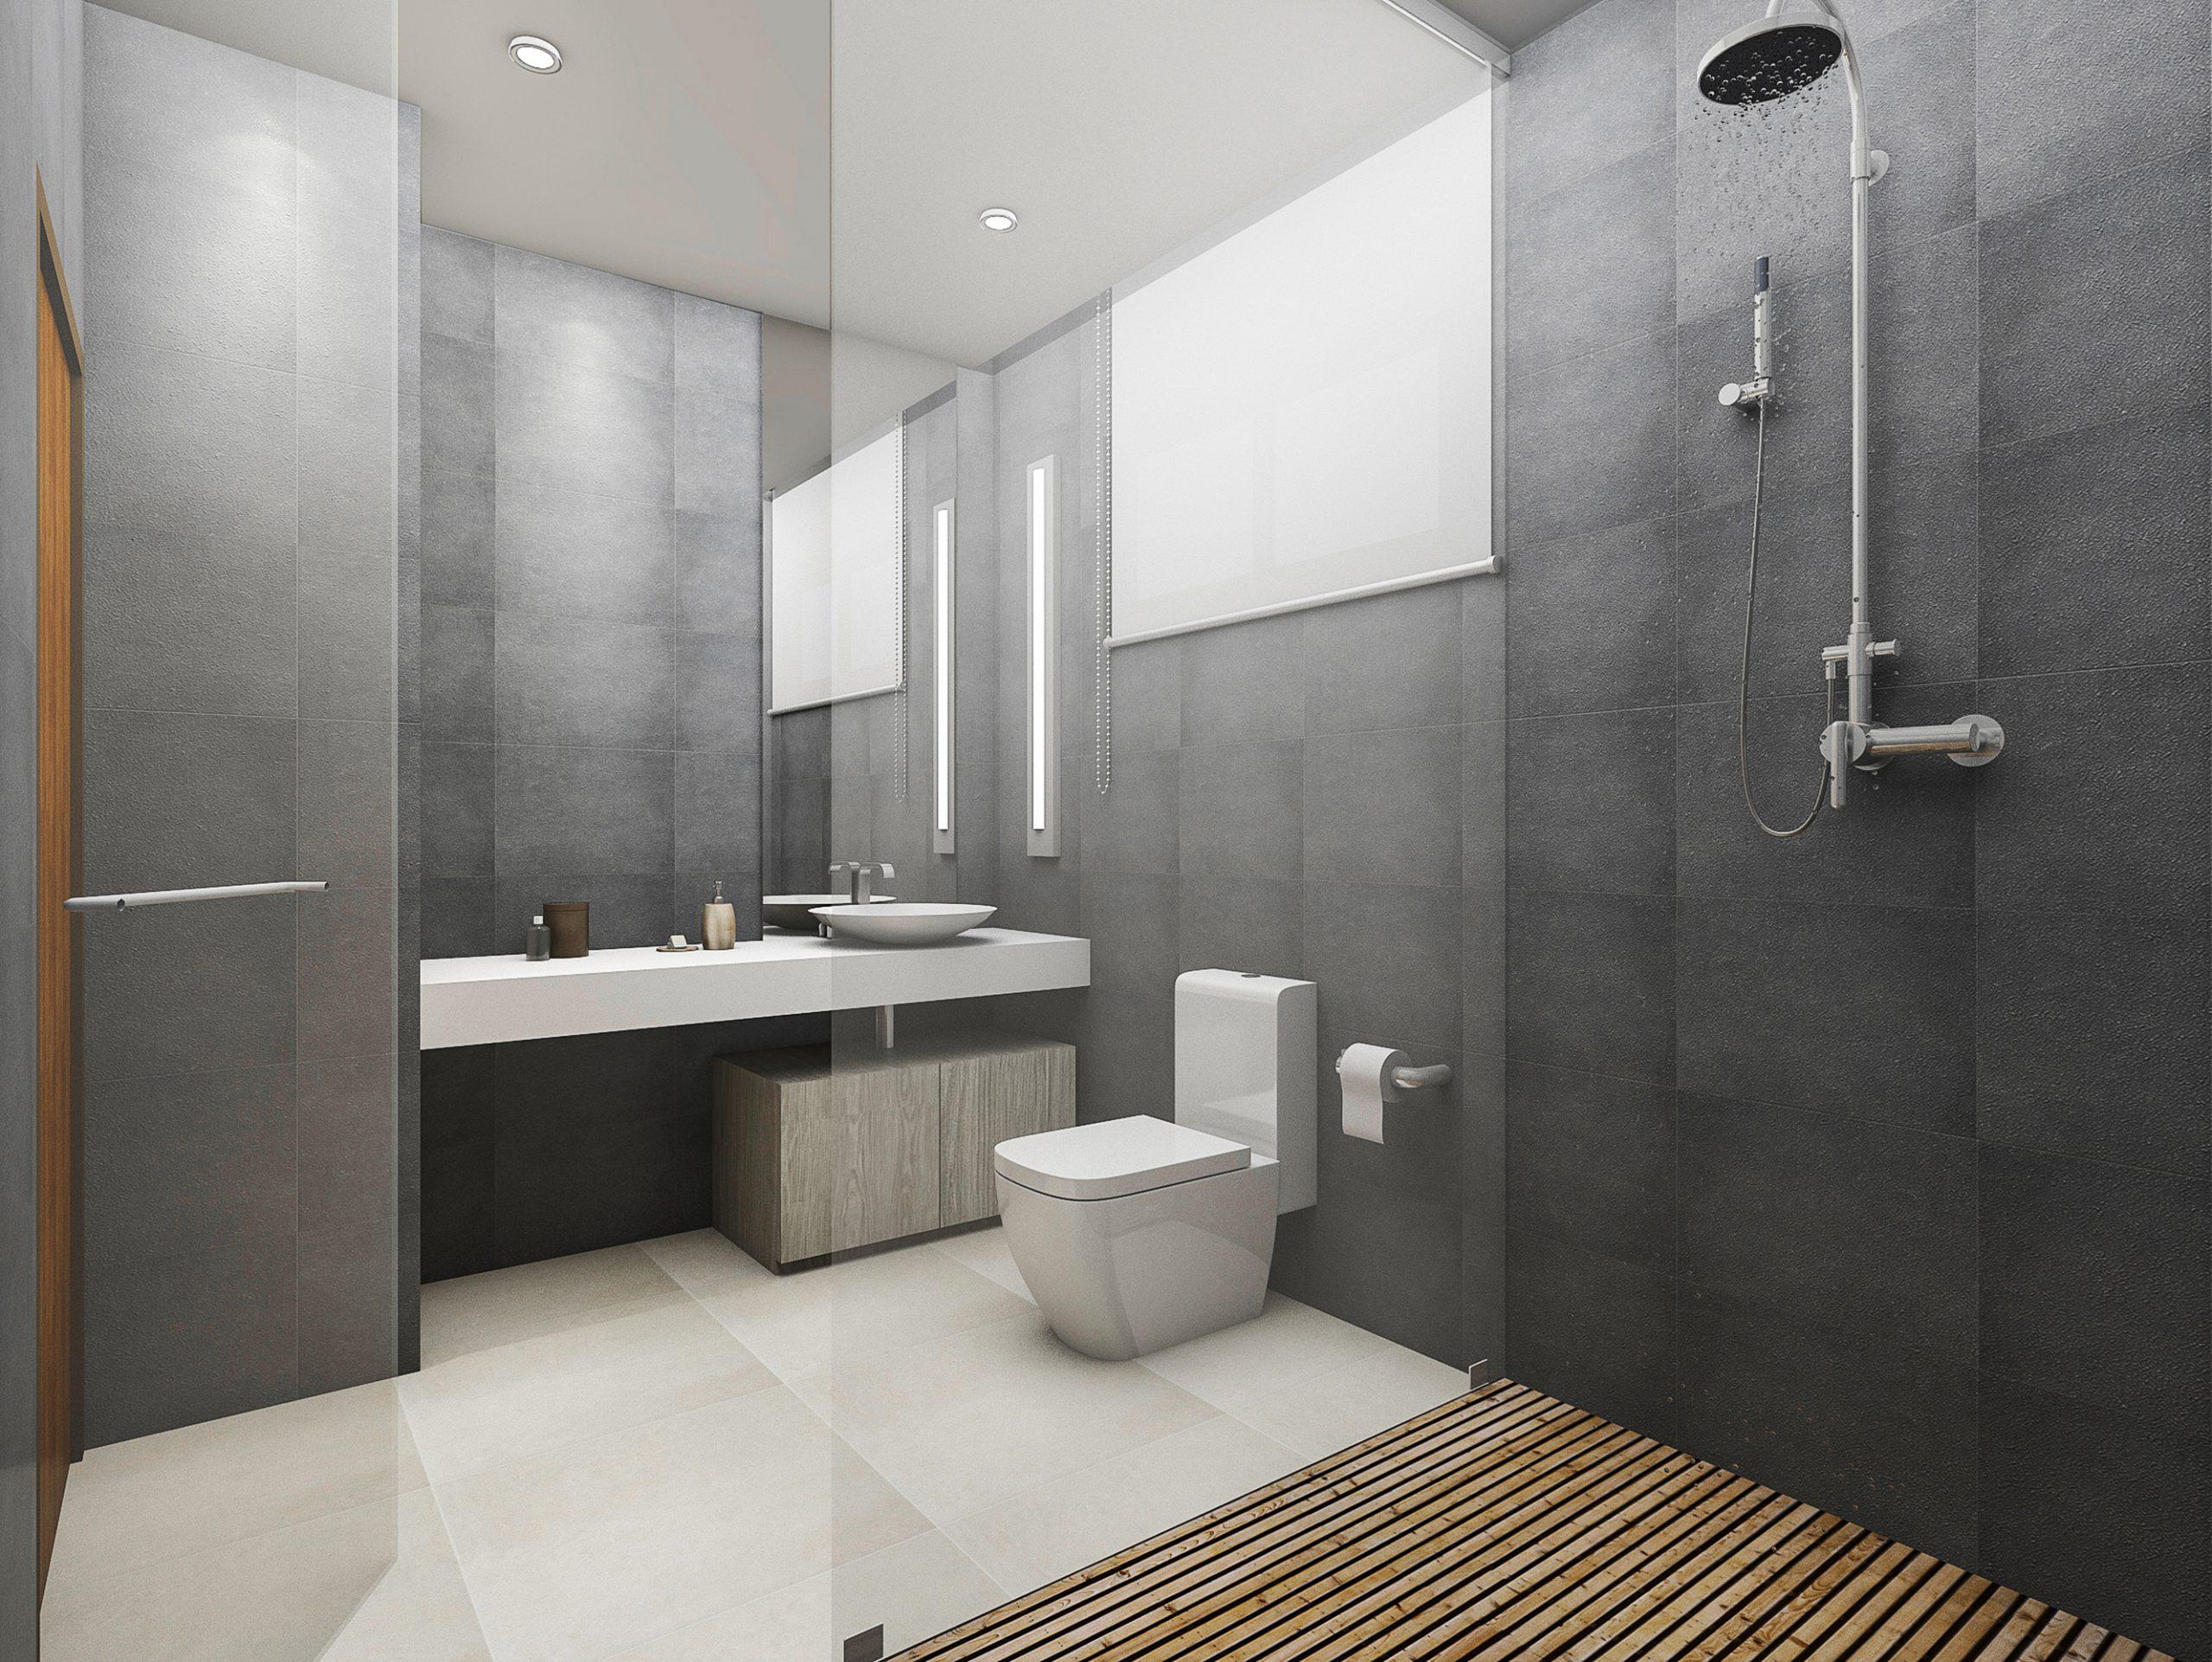 6 Stunning Bathroom Tile Ideas For Your, Bathroom Tile Ideas Pictures